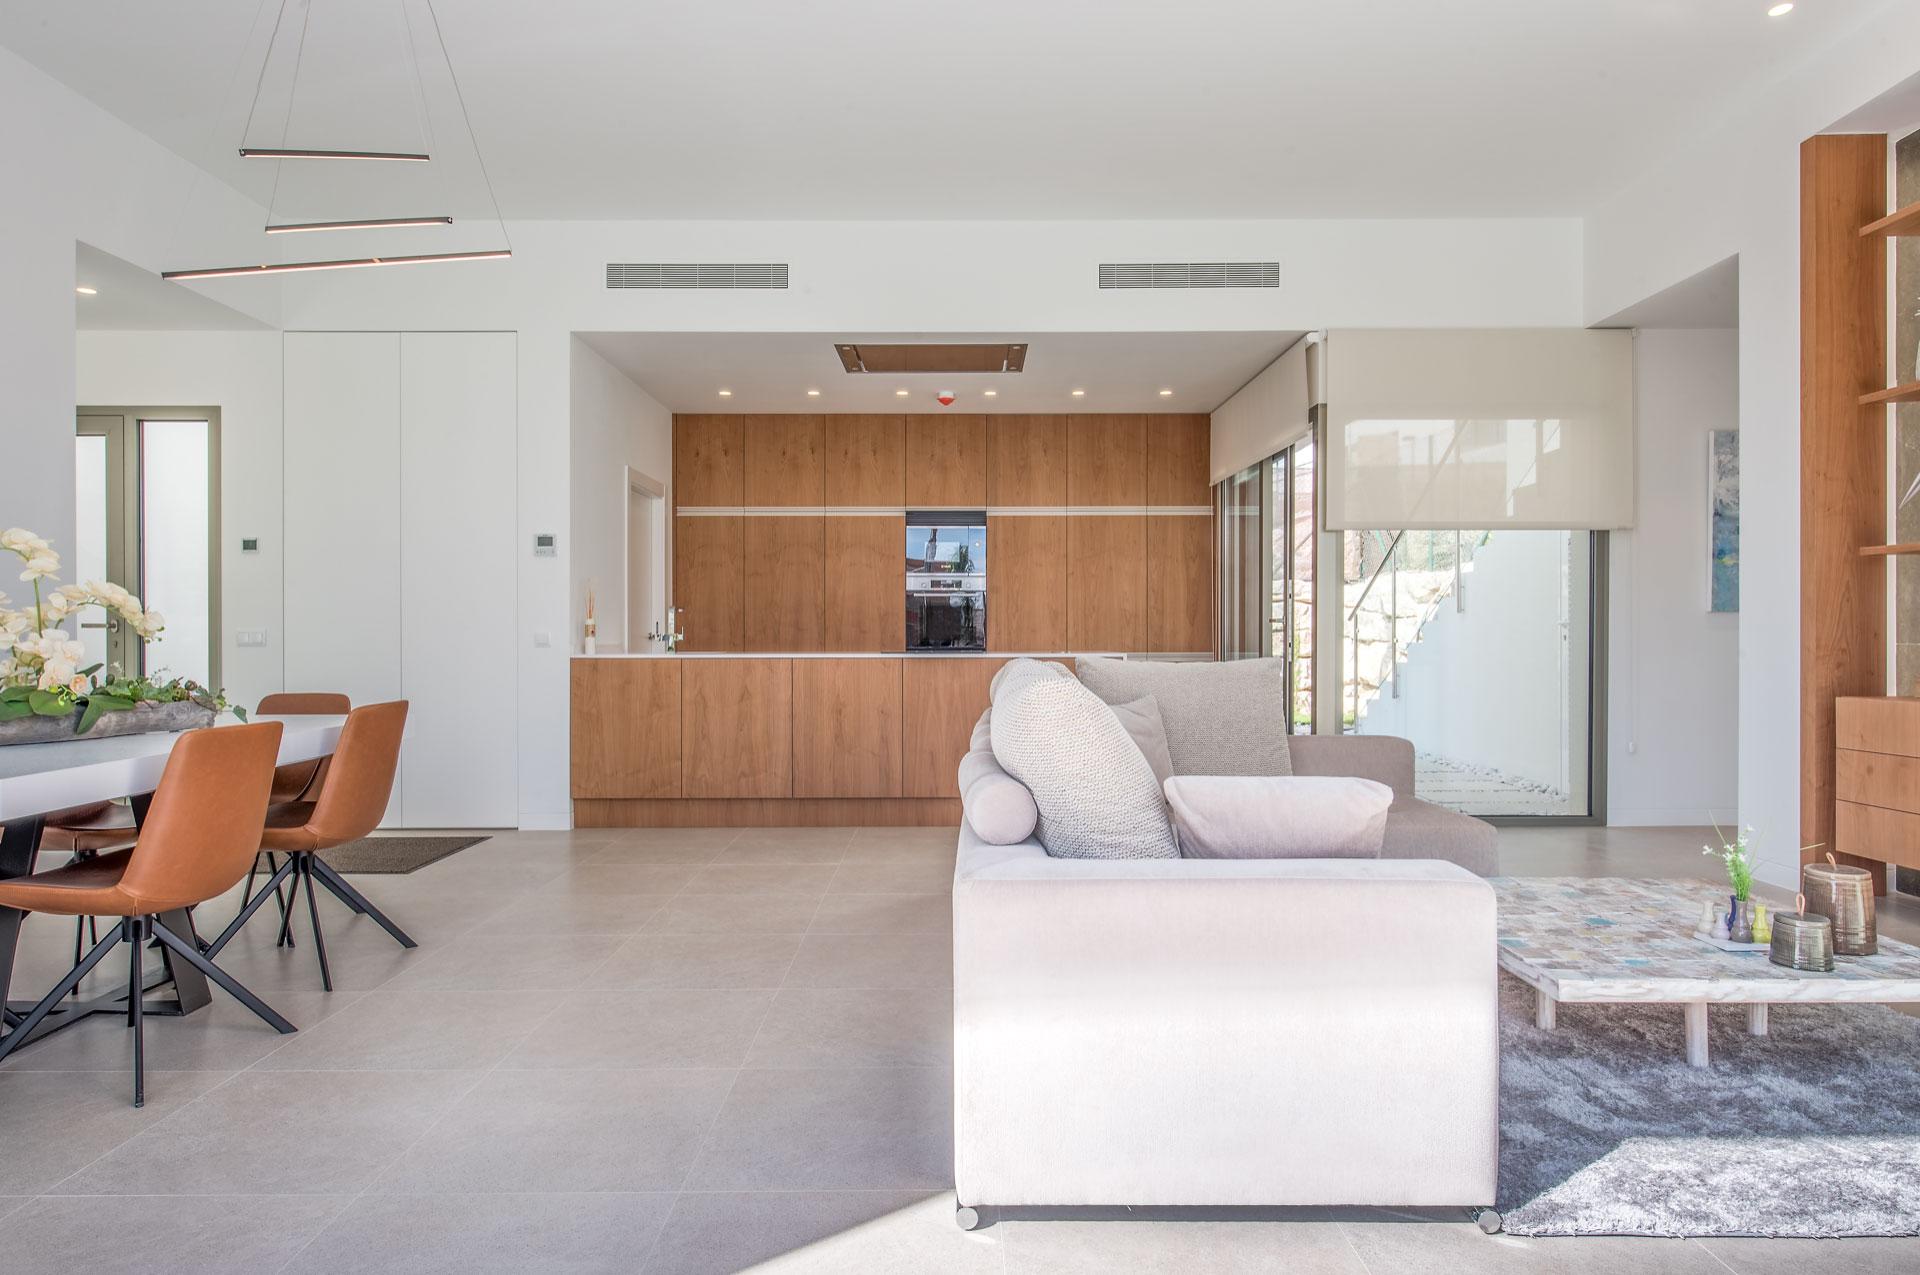 4 bedroom villa For Sale in Finestrat - photograph 2